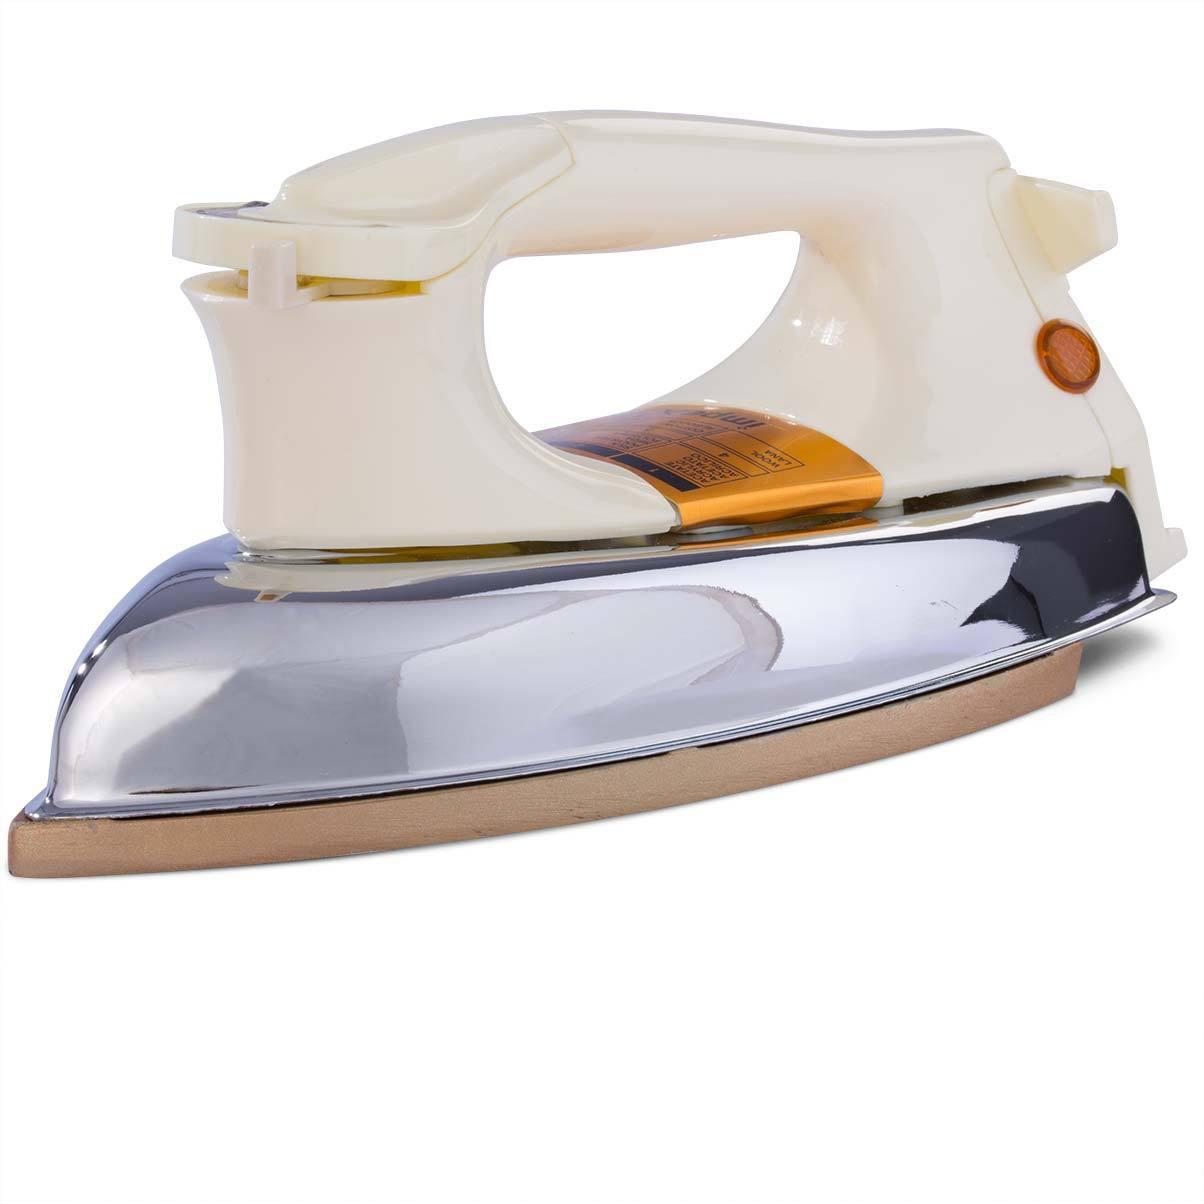 View Impex IB22 Dry Iron(White) Home Appliances Price Online(Impex)